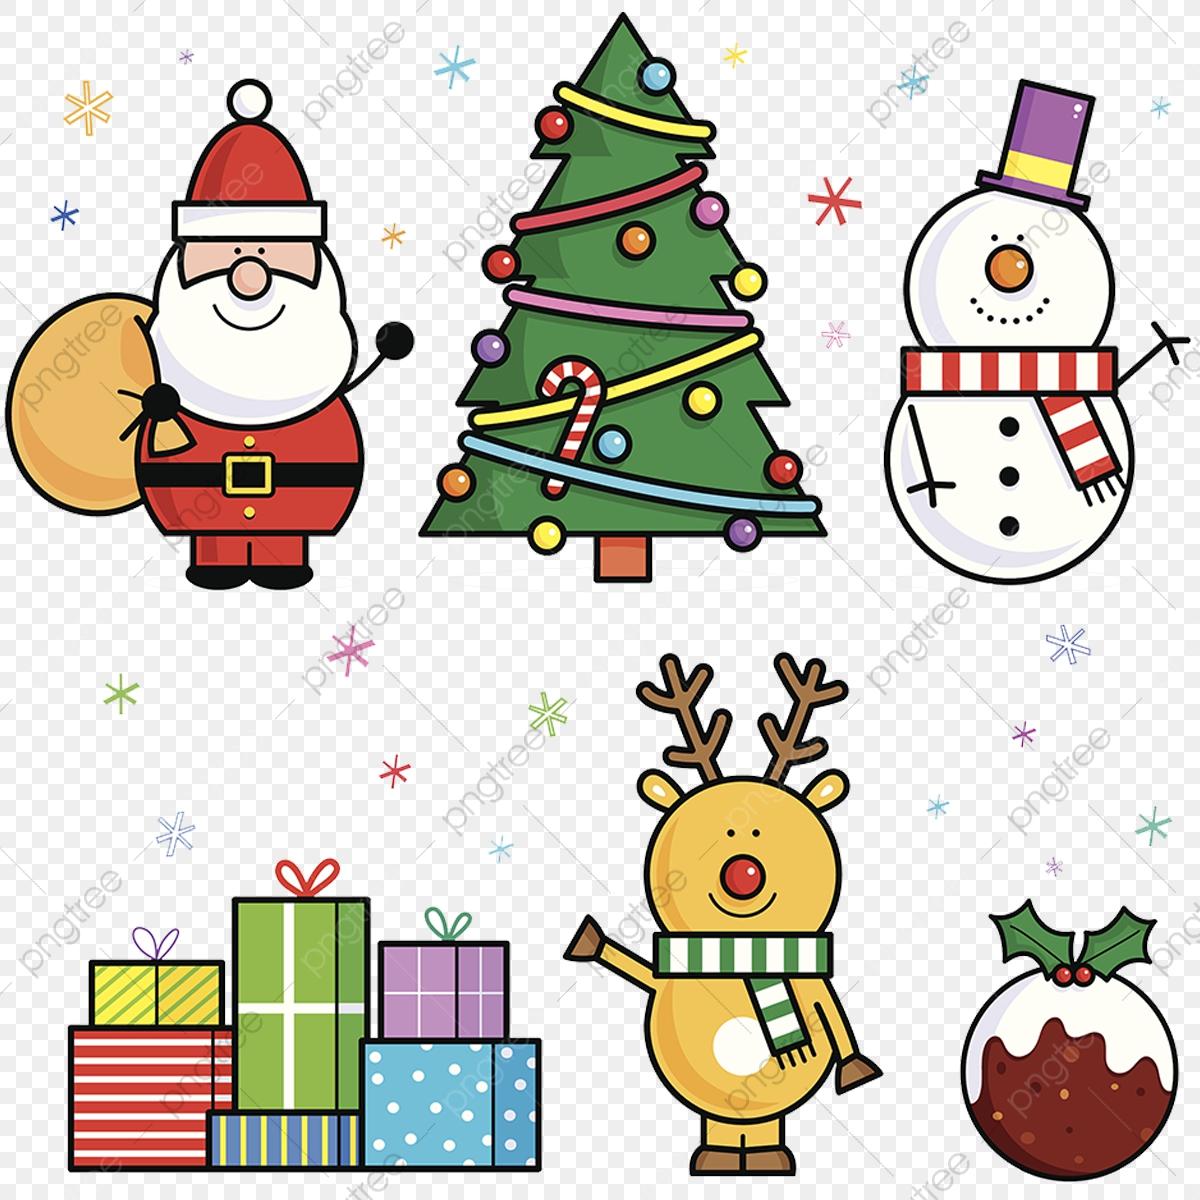 Christmas Cartoon Patterns, Cartoon, Clipart, Christmas PNG.